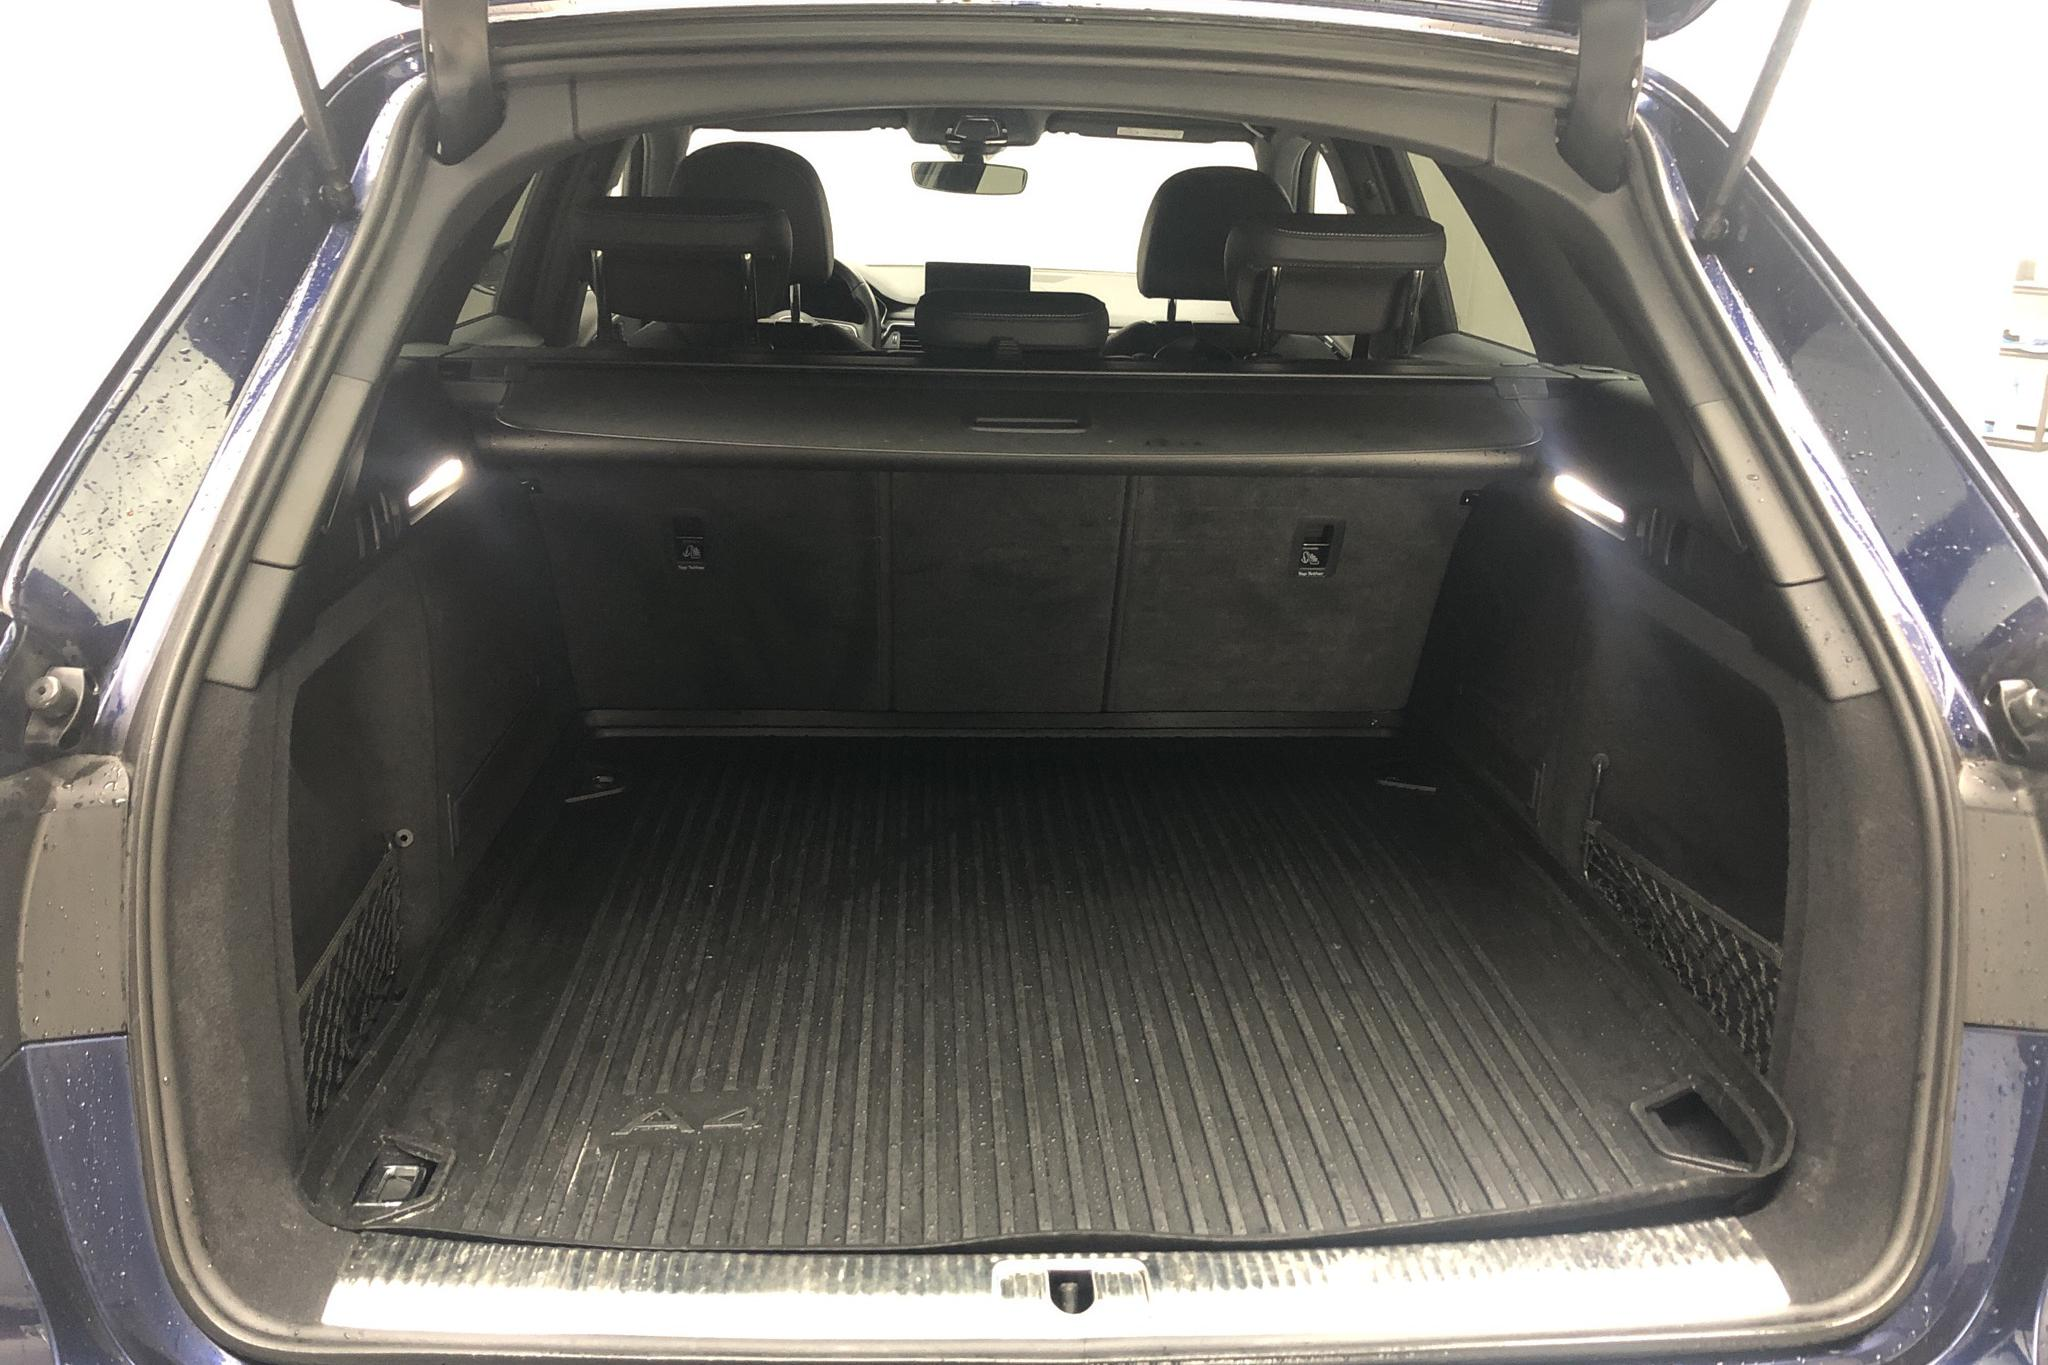 Audi S4 3.0 TFSI Avant quattro (354hk) - 7 928 mil - Automat - blå - 2018